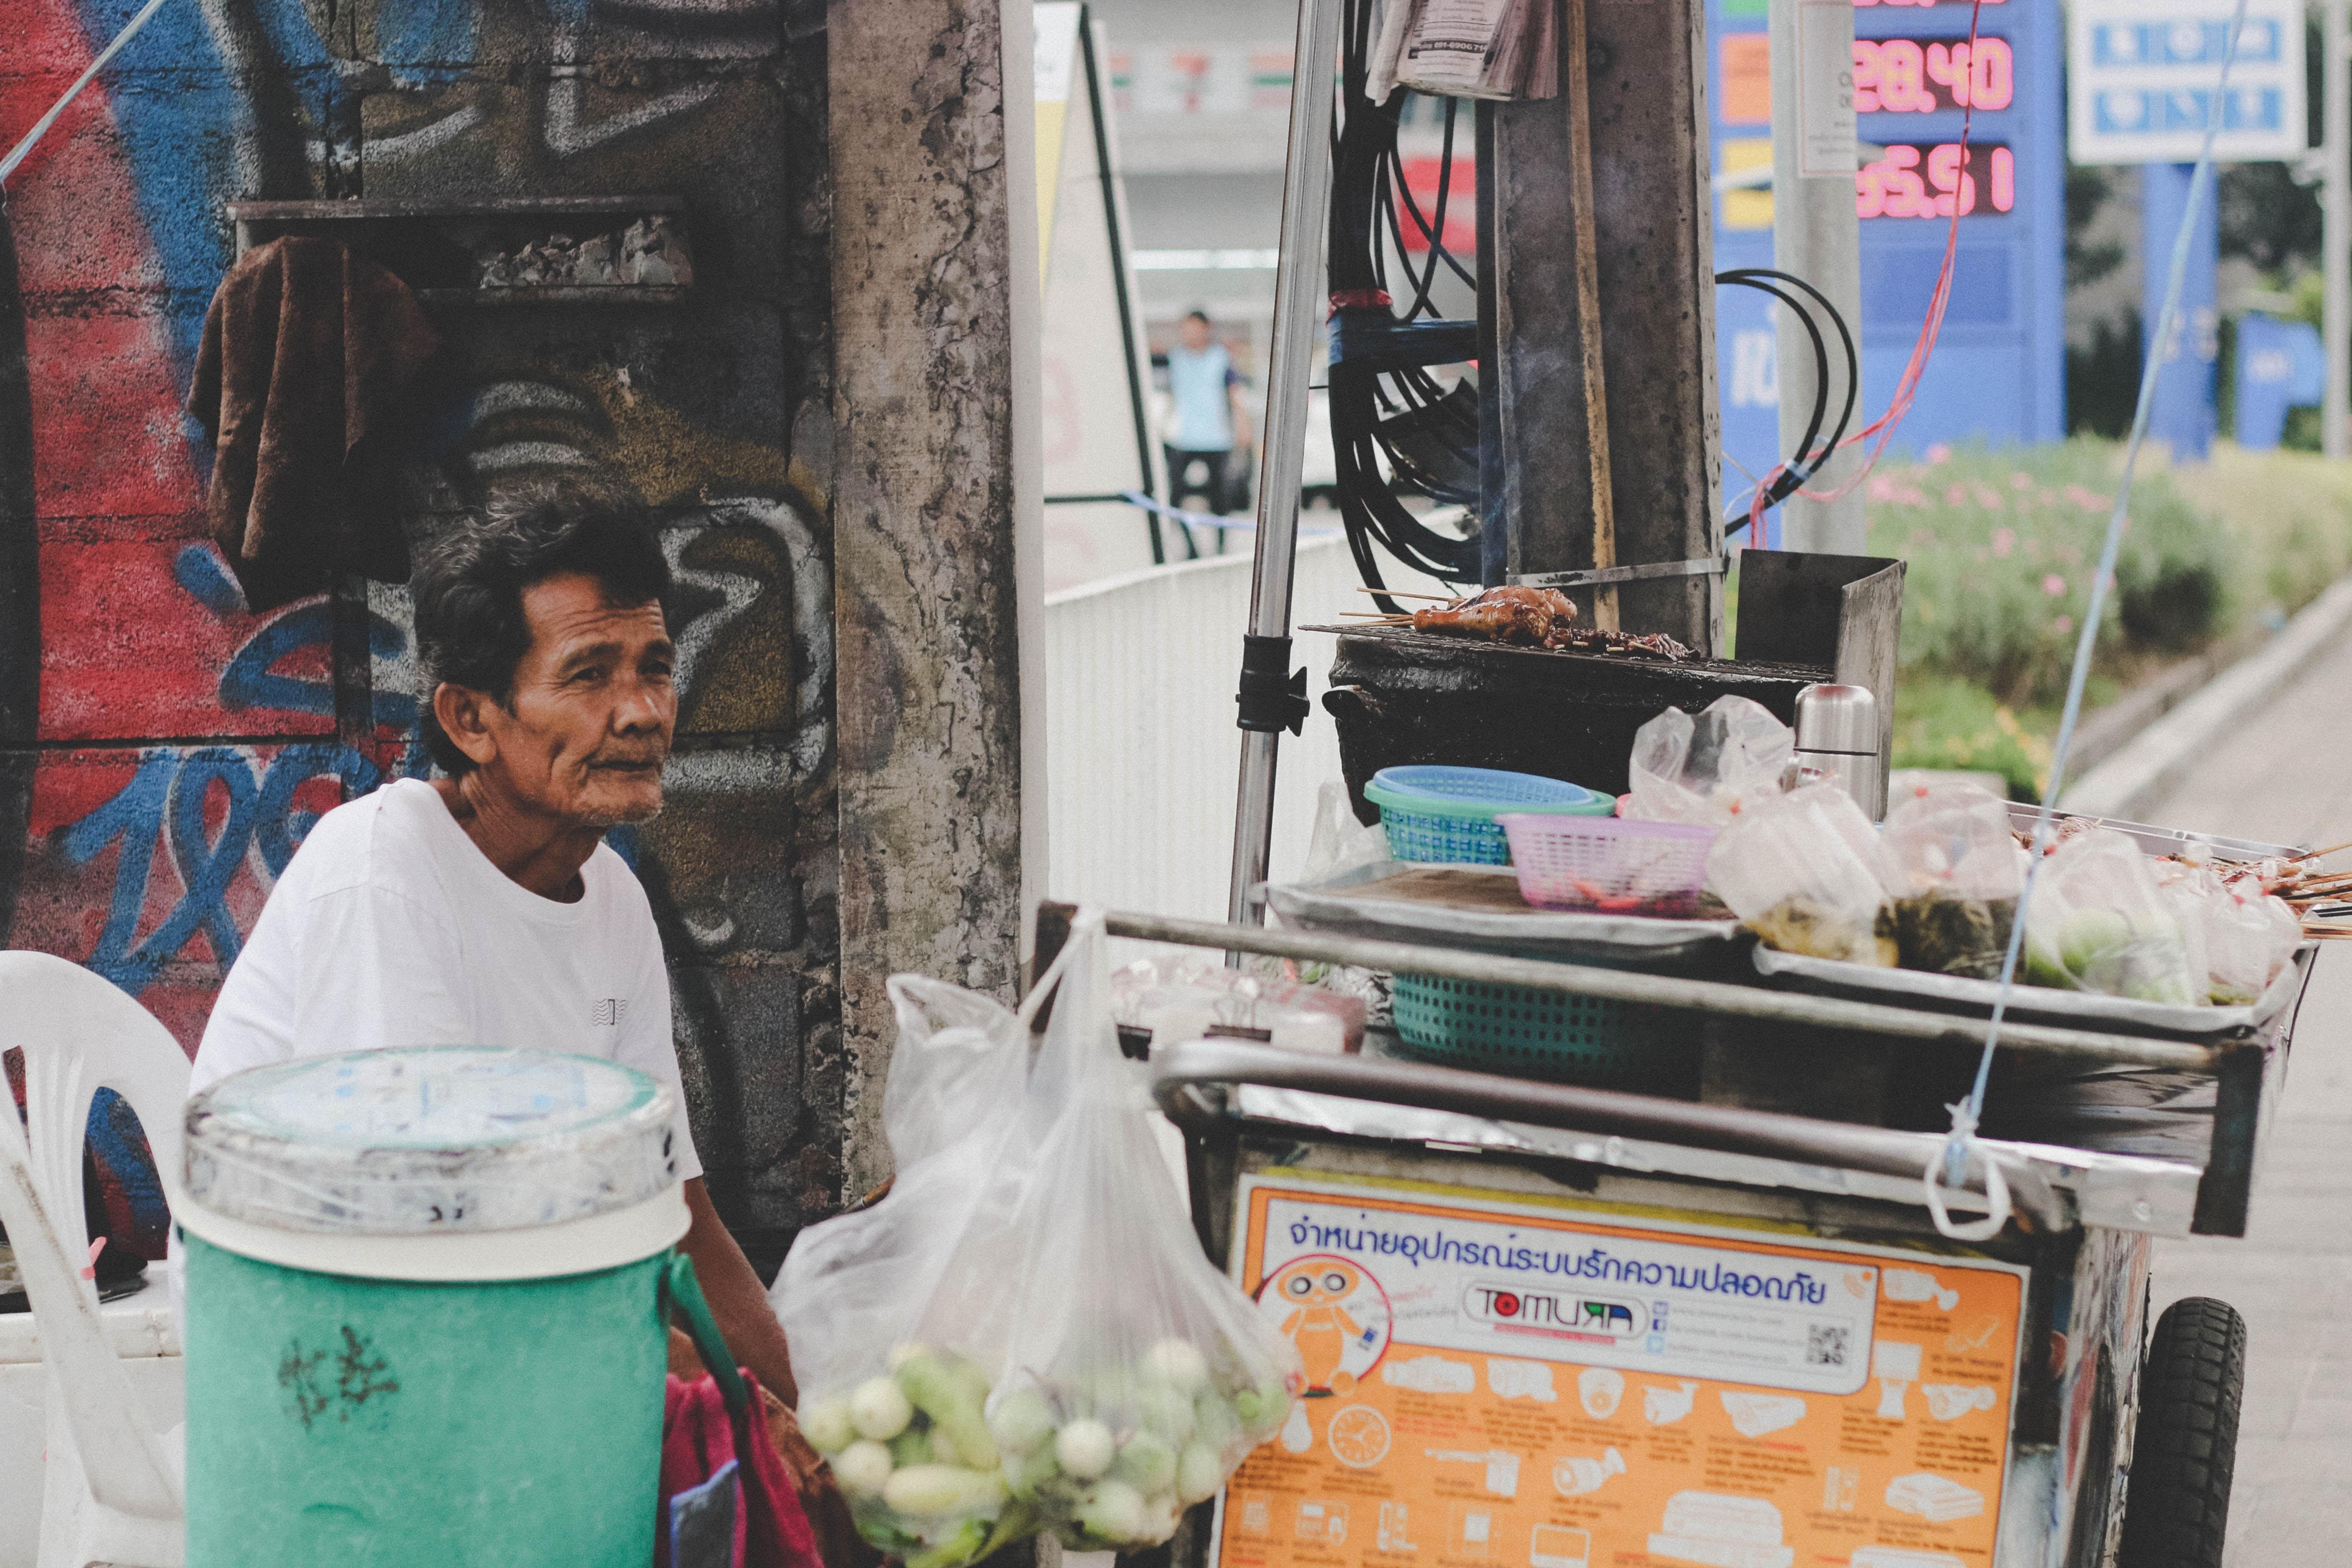 Digital Nomad in Bangkok